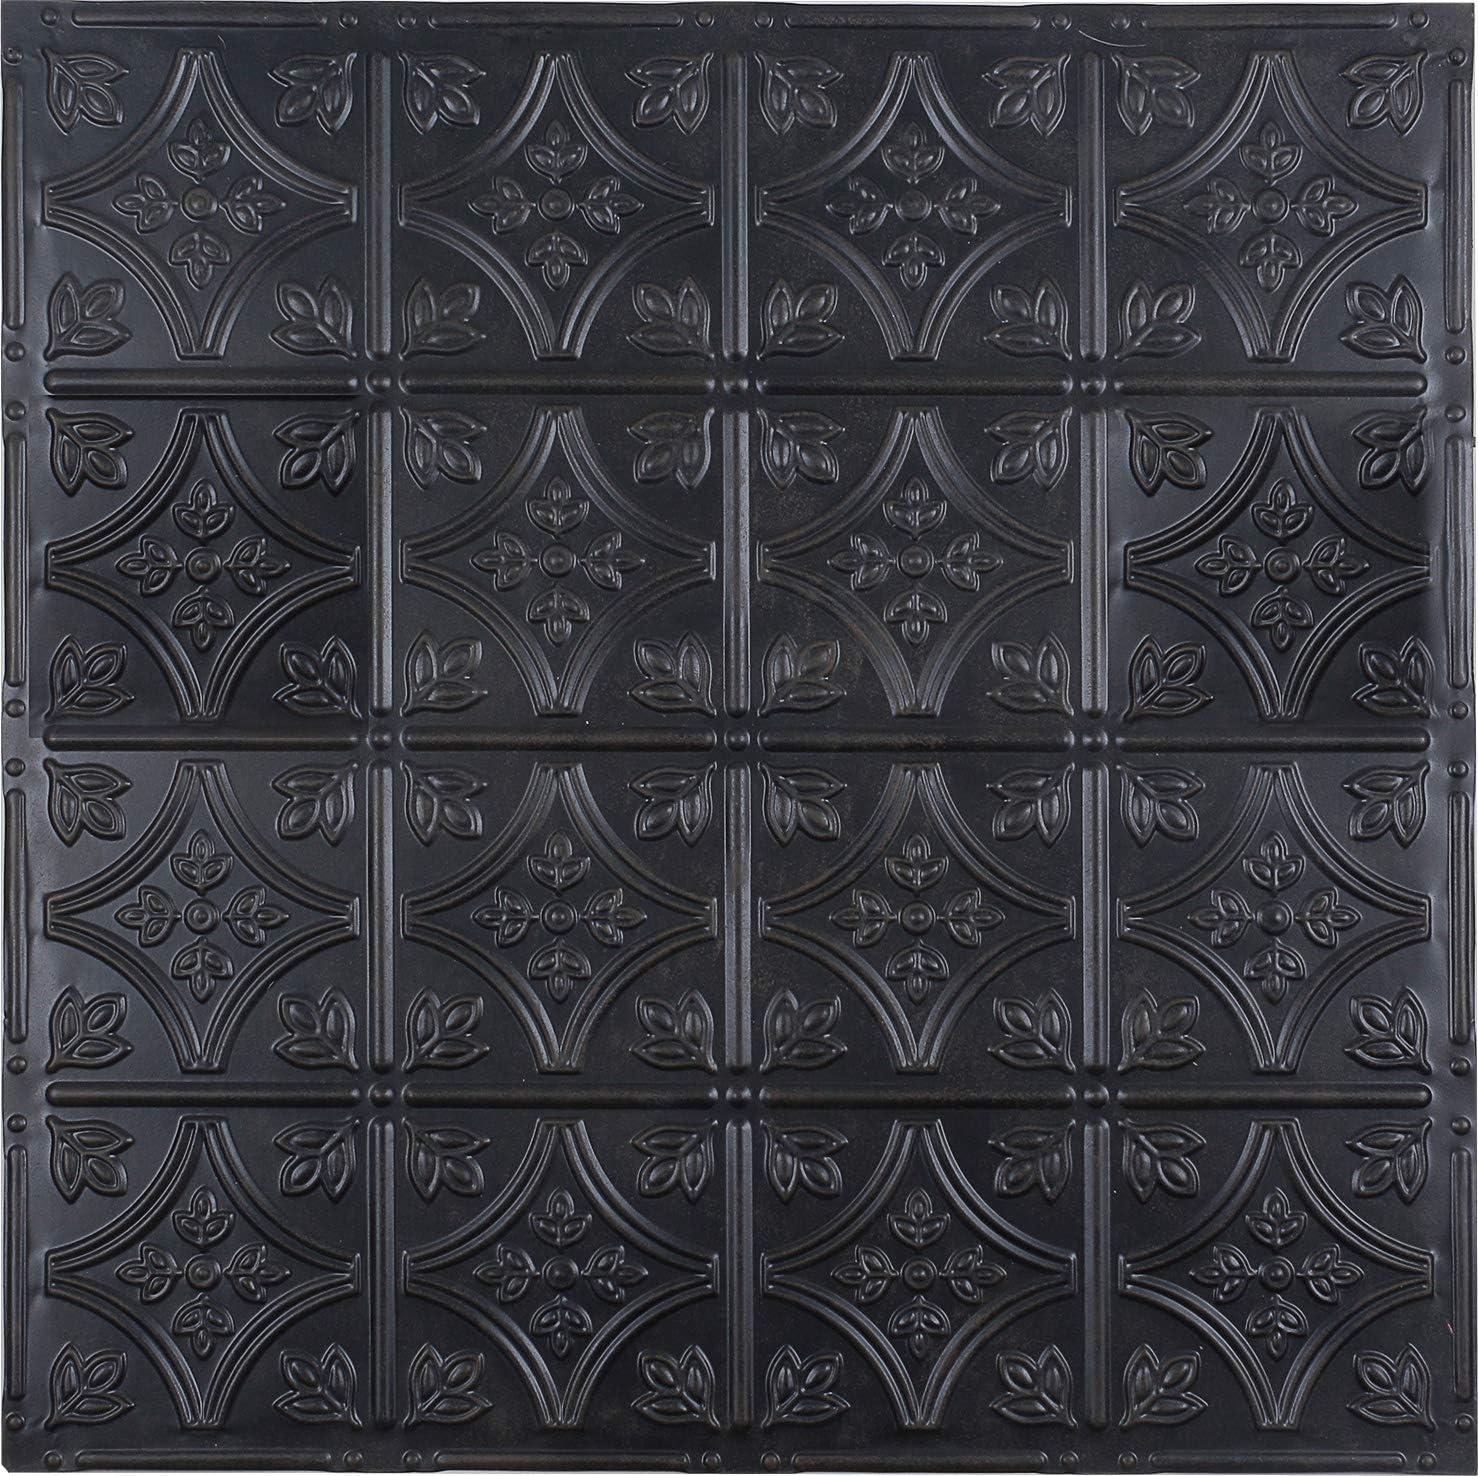 Holydecot Tin Wall Tiles 24x24 Nail-Up Tin Wall Tile, 5 Pack (Black)